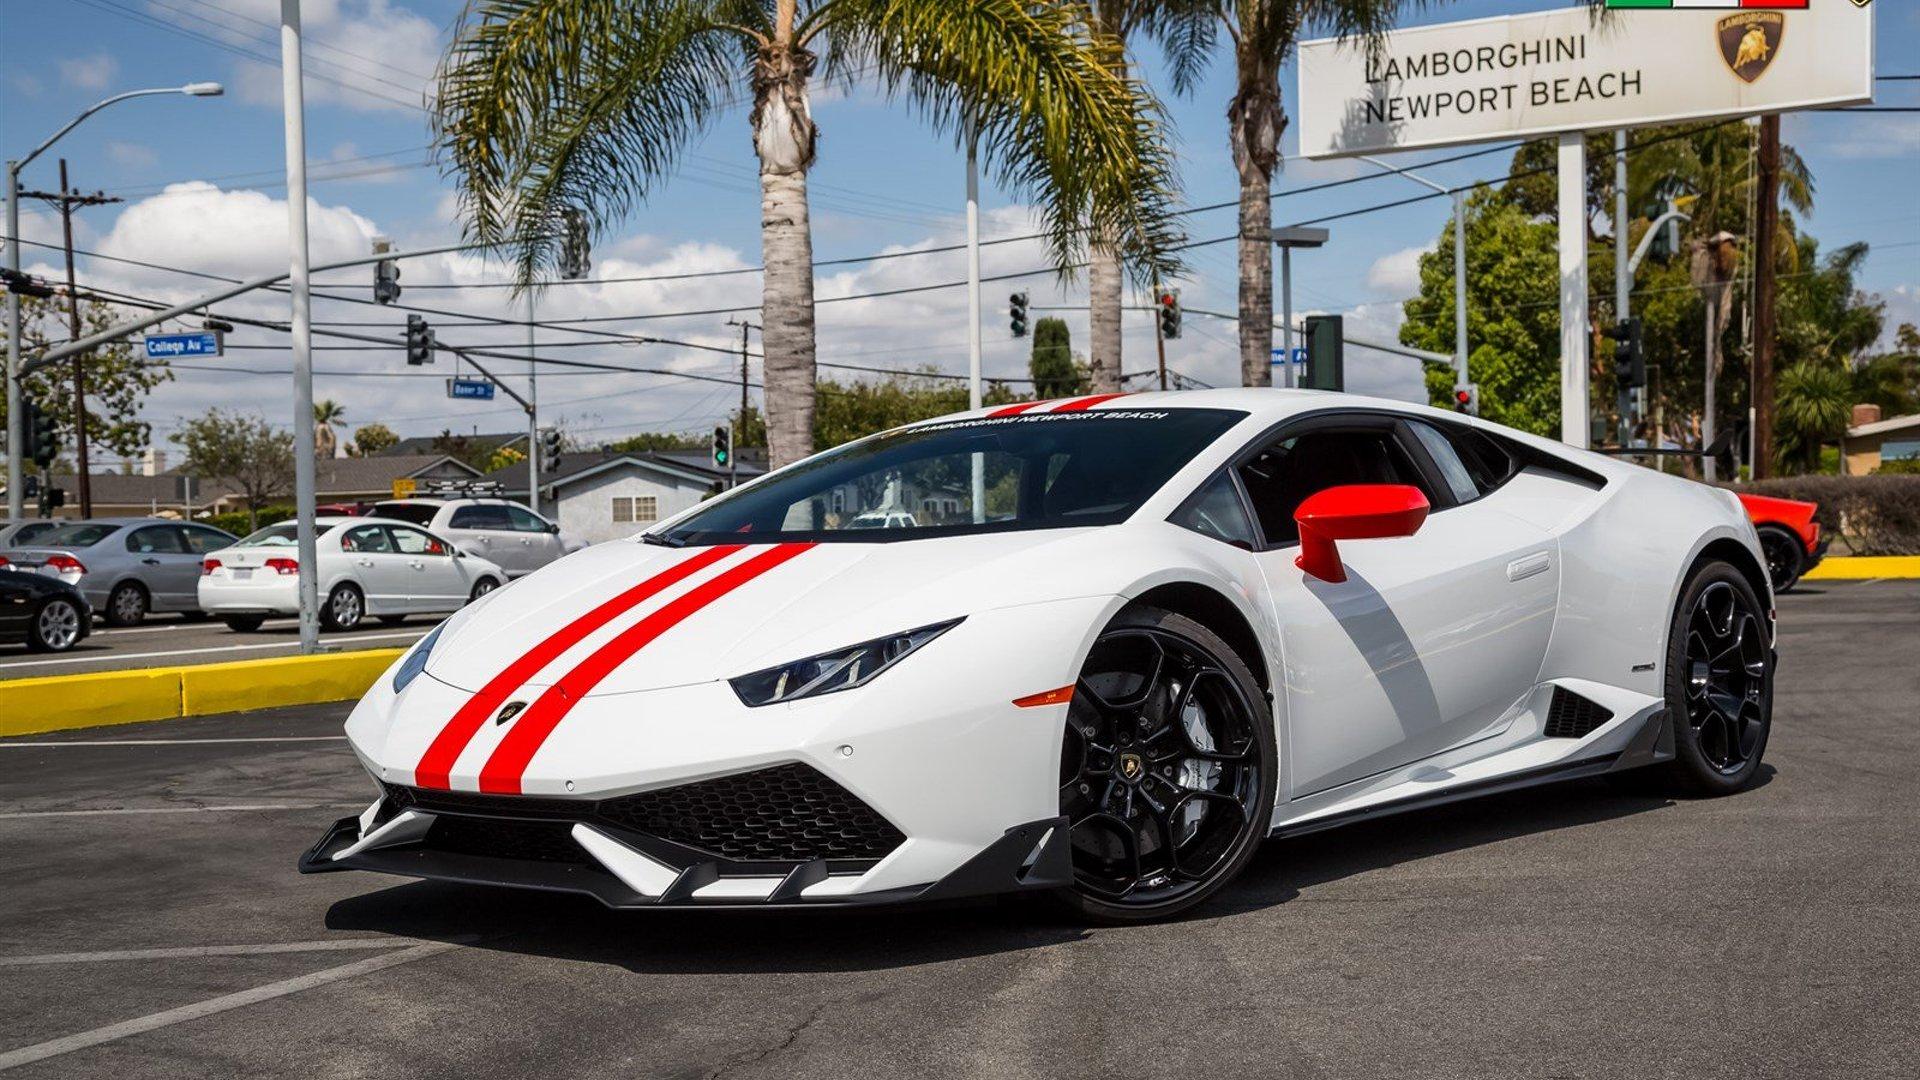 Lamborghini Huracan With Aero Pack Real Life Photos Surface